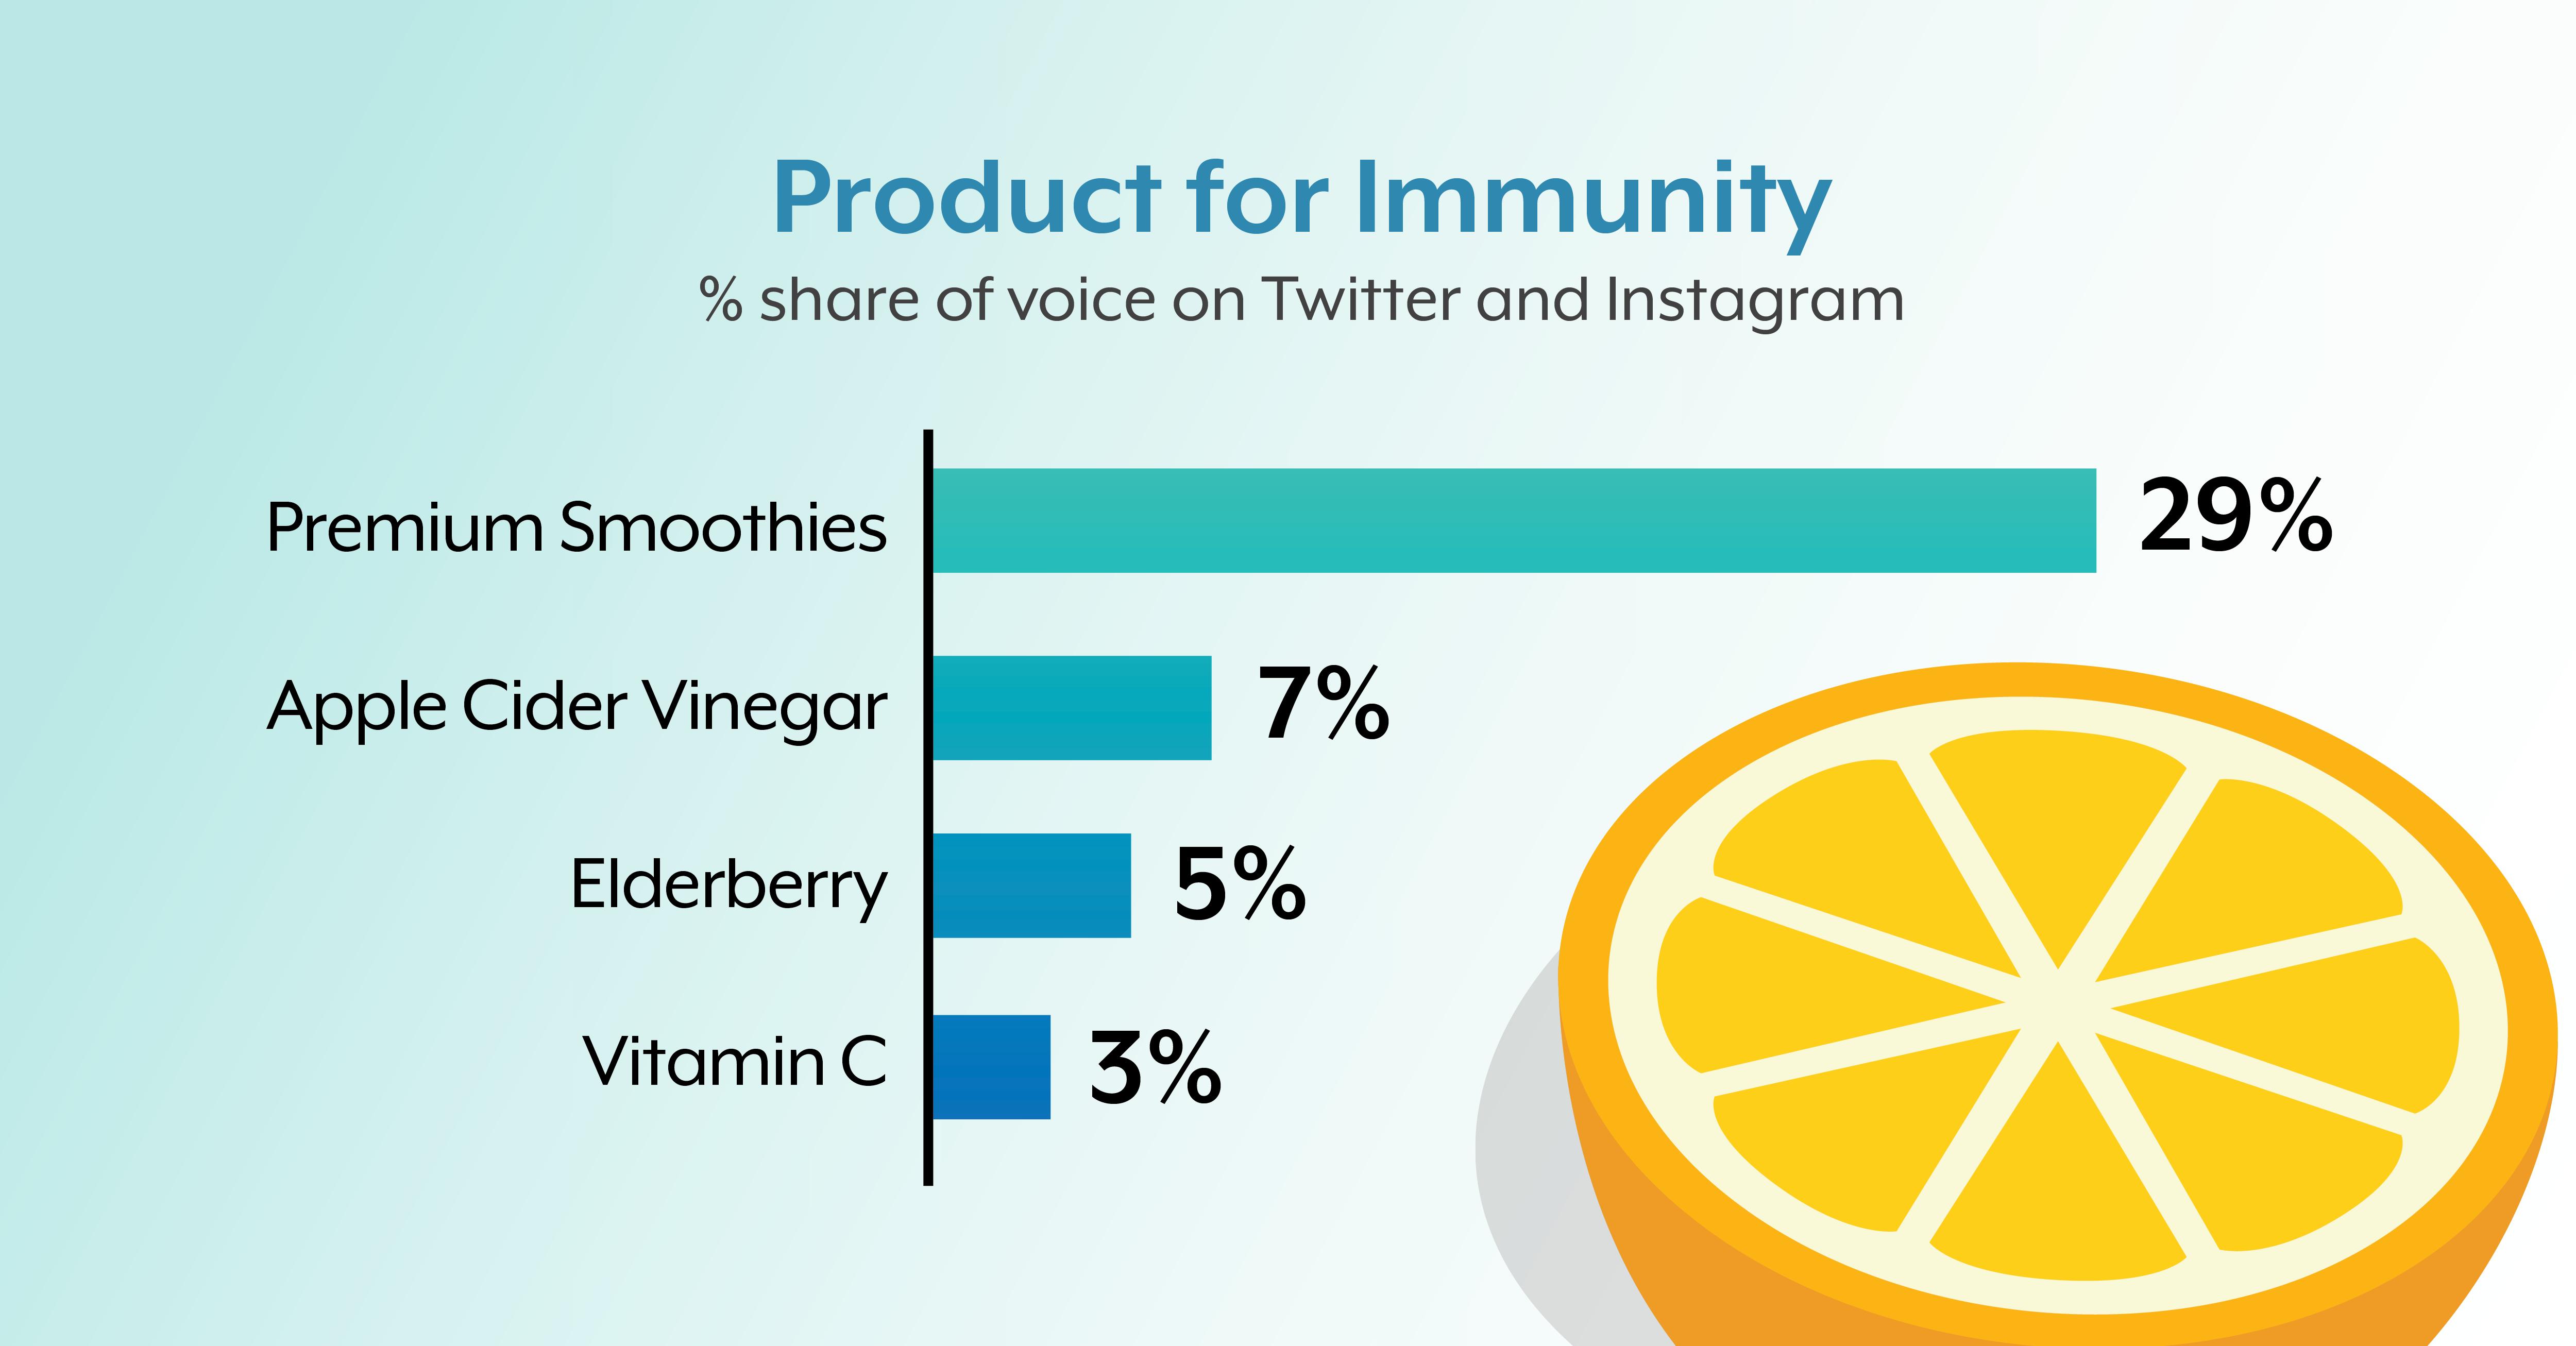 wellness-immunity-product-social-listening-data